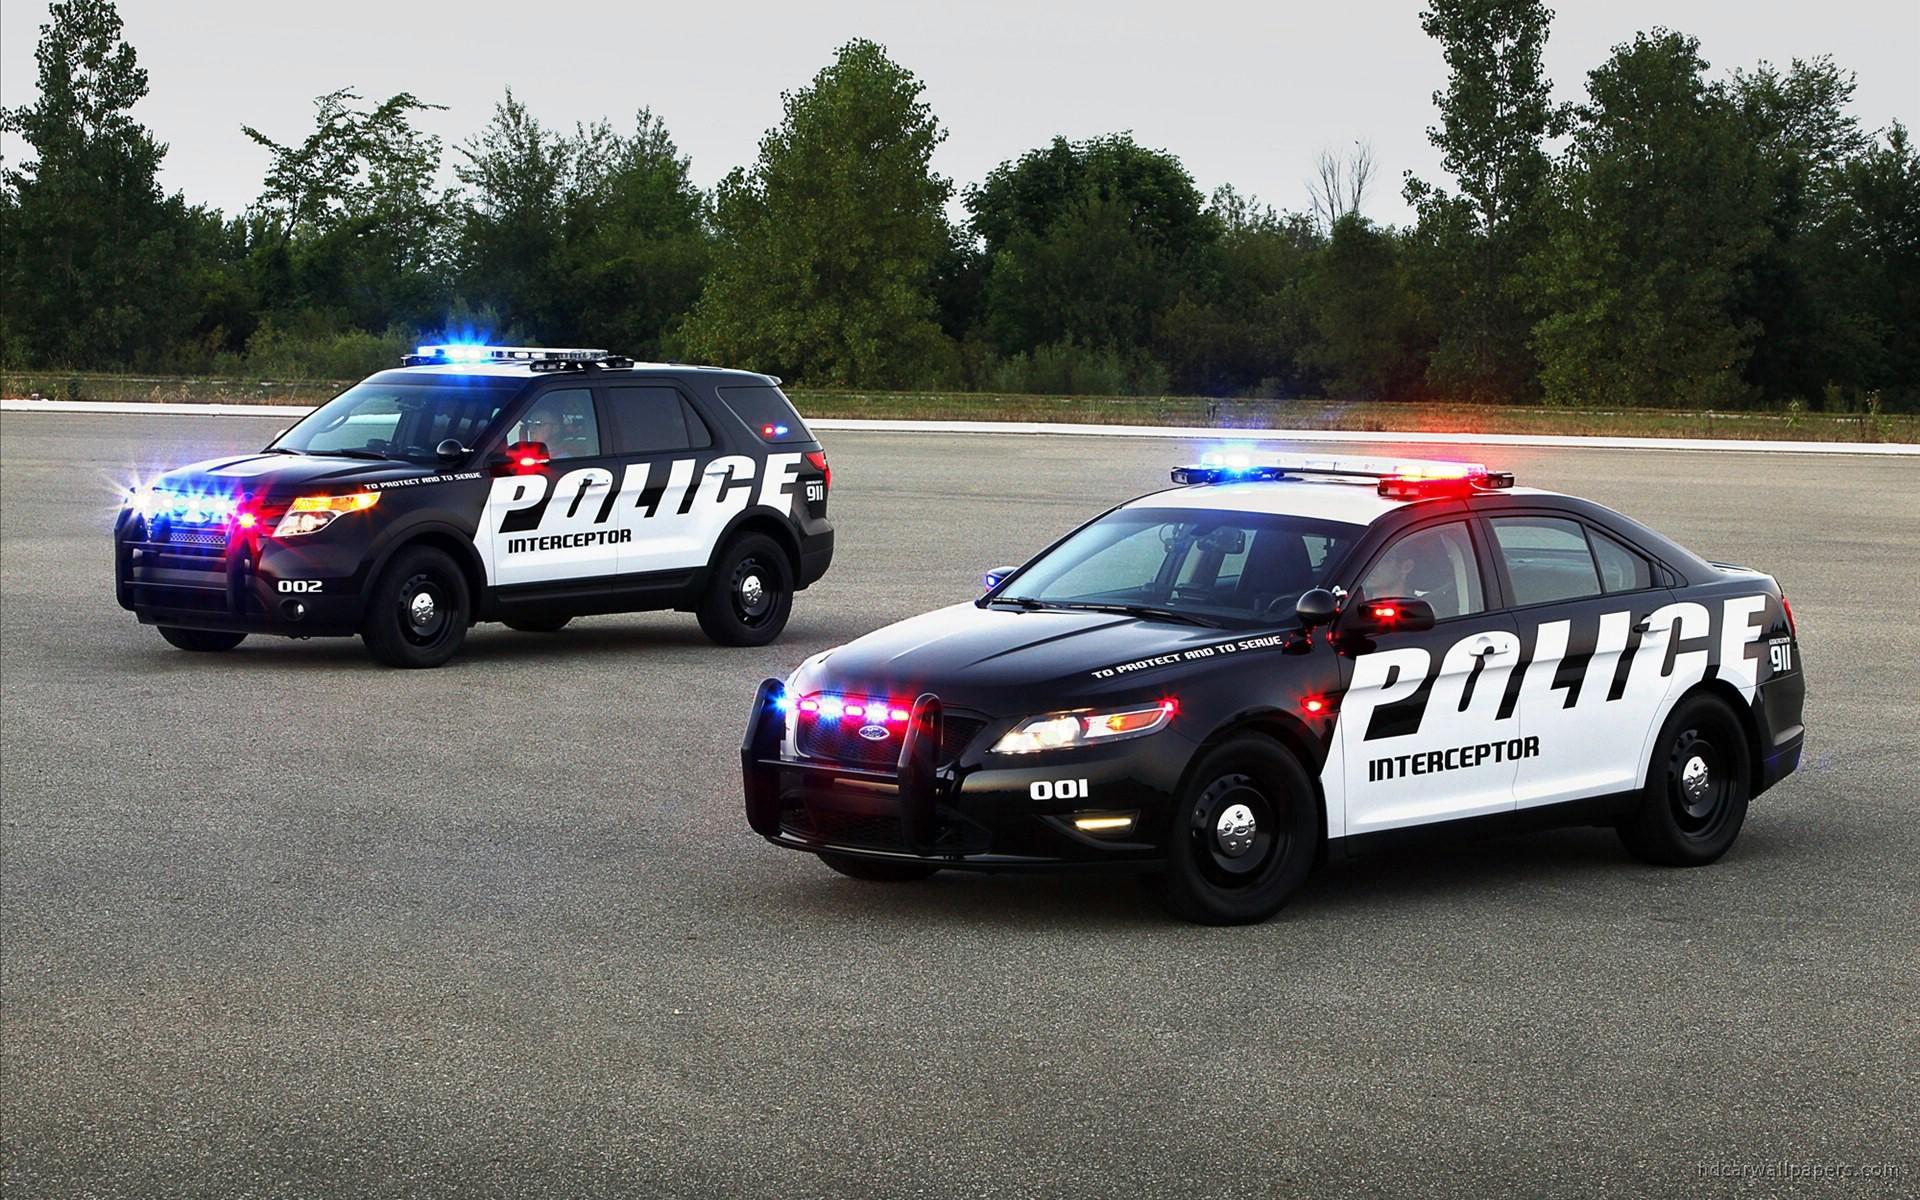 2011 Ford Police Interceptor SUV 2 Wallpaper | HD Car Wallpapers